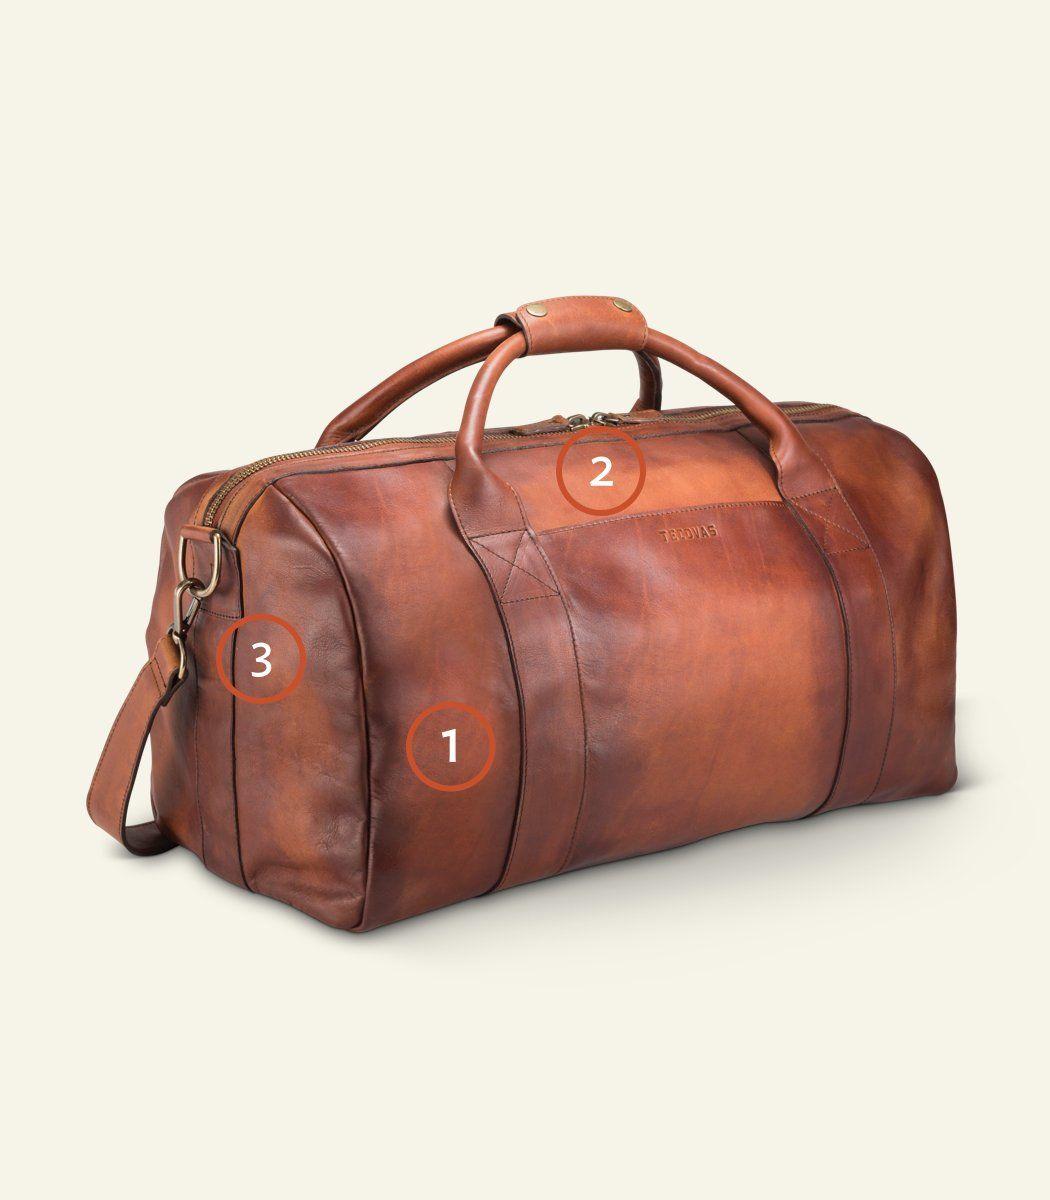 Weekender Duffle - A 100% Handmade Leather Bag   Tecovas   Leather ... 77315550b0